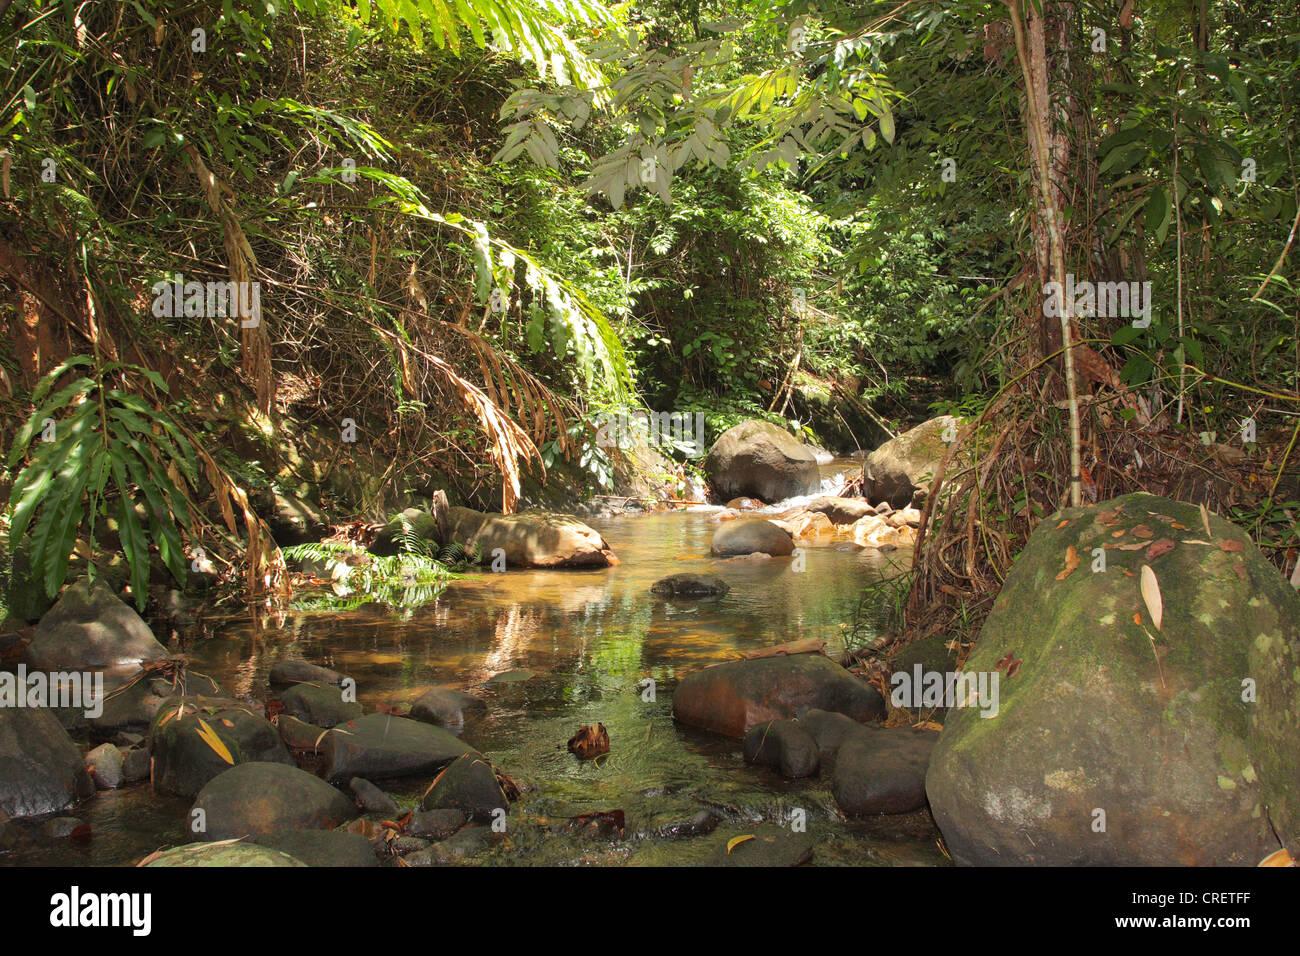 Khao Sok Nationalpark - Jungle Adventure South East Asia